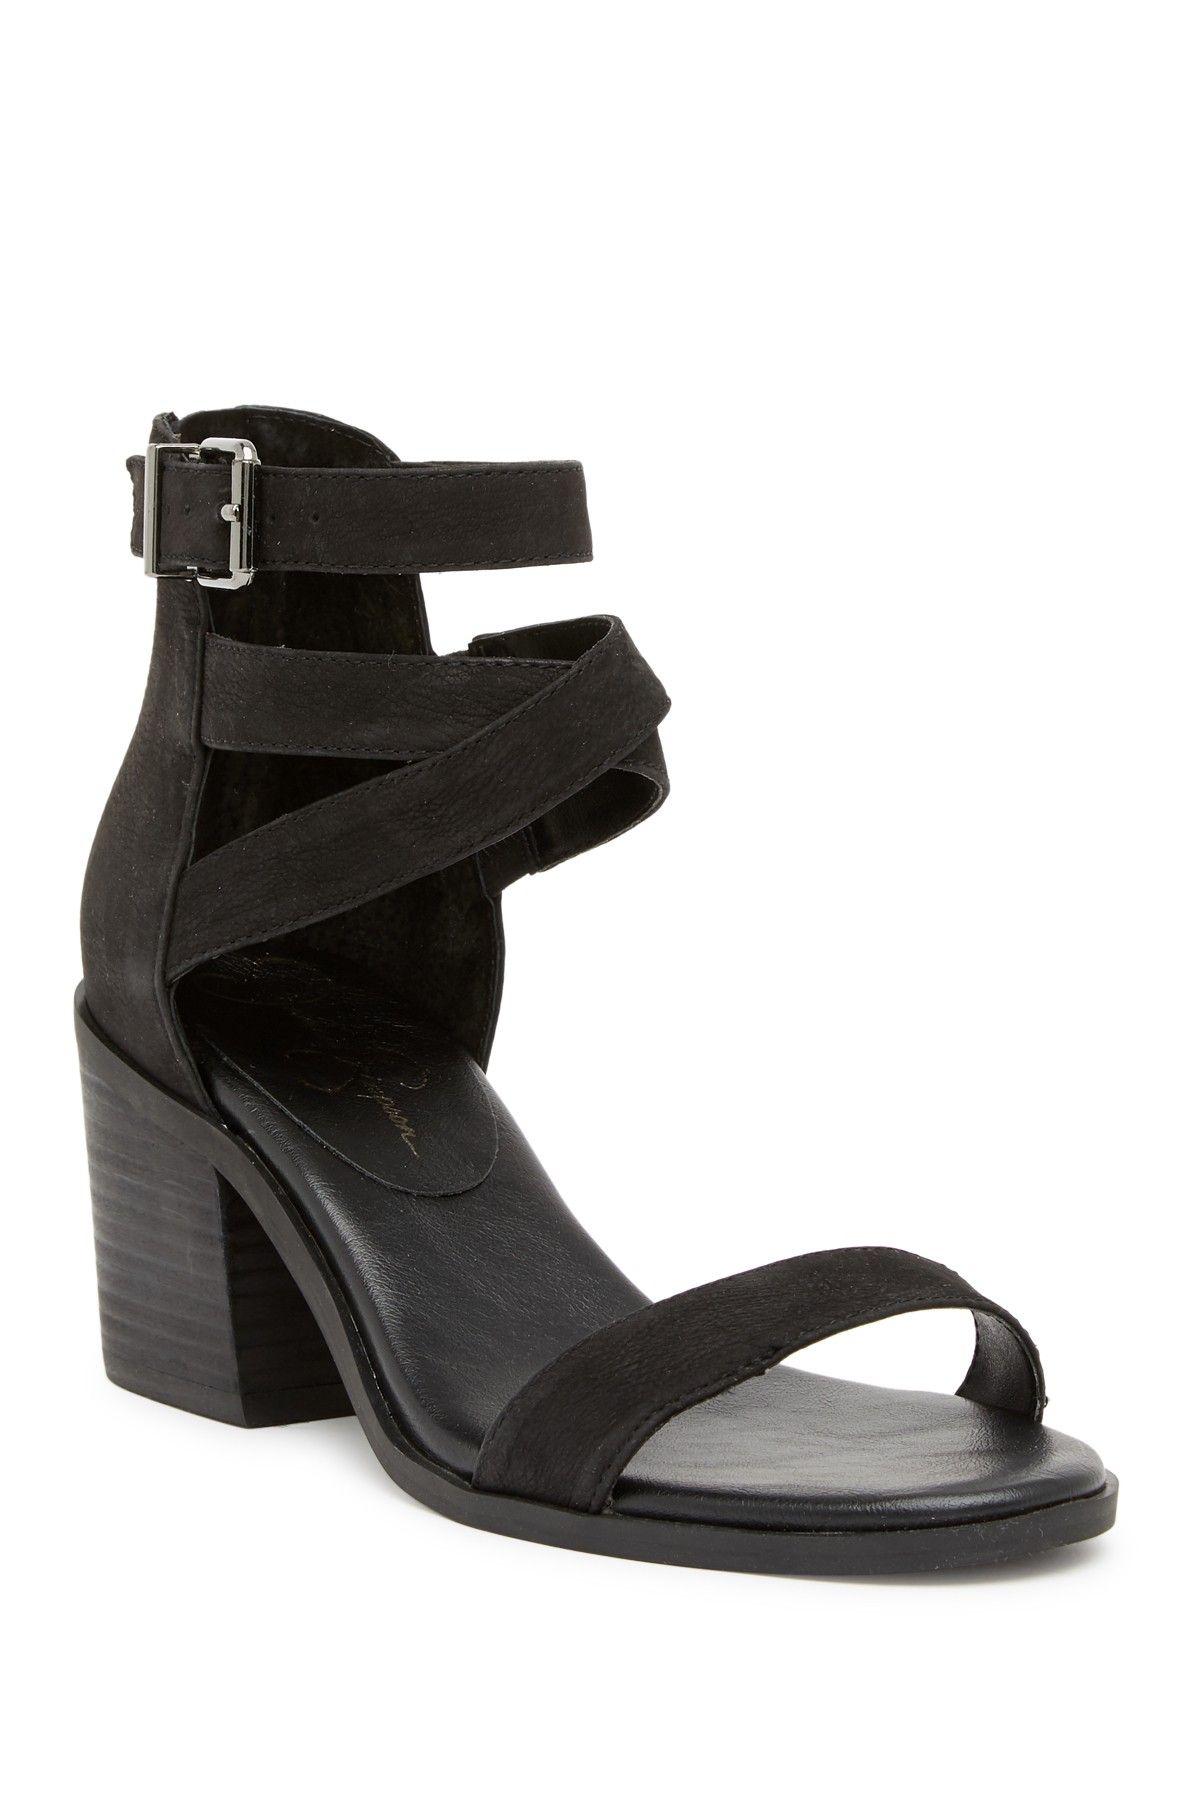 d81ba91bc93 Image of Jessica Simpson Rayvena Block Heel Sandal